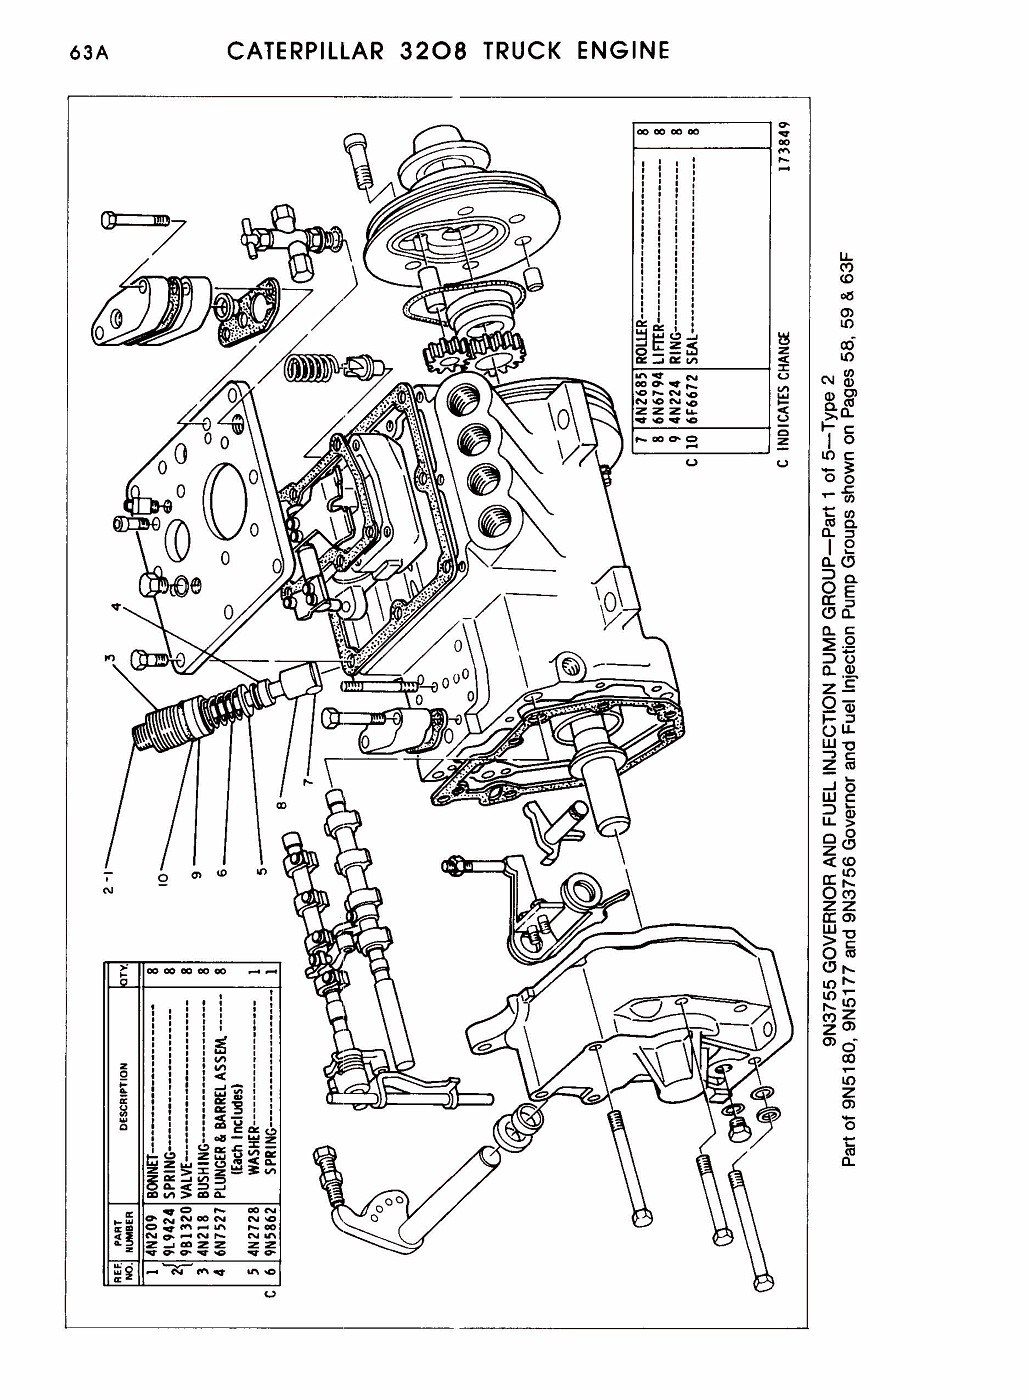 Wg Cat Engine Fuel System Besides Cat E Ecm